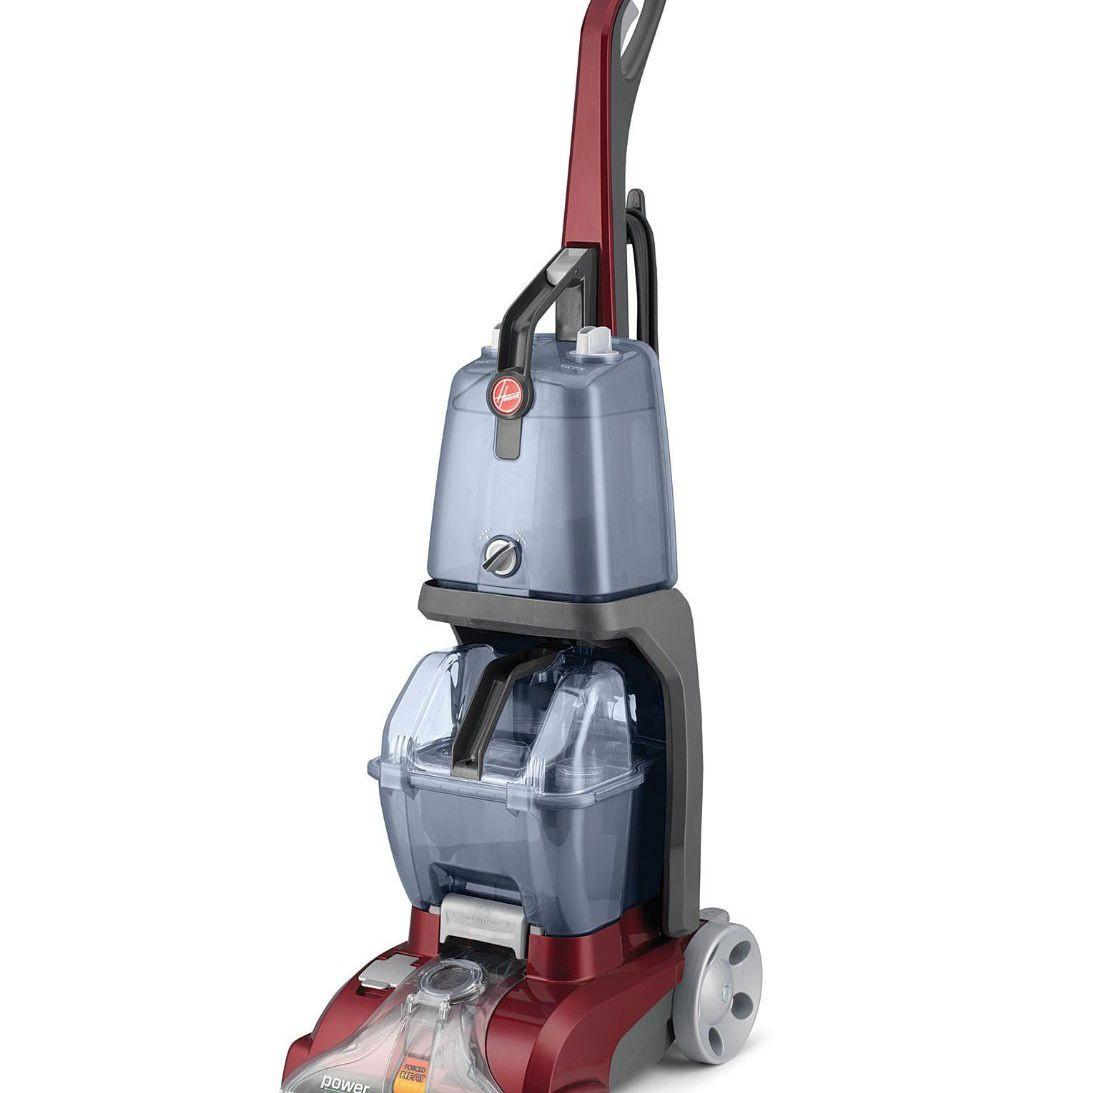 best sweeper for hardwood floors of the 8 best floor cleaning supplies to buy in 2018 regarding best carpet cleaner hoover fh50150 carpet basics power scrub deluxe